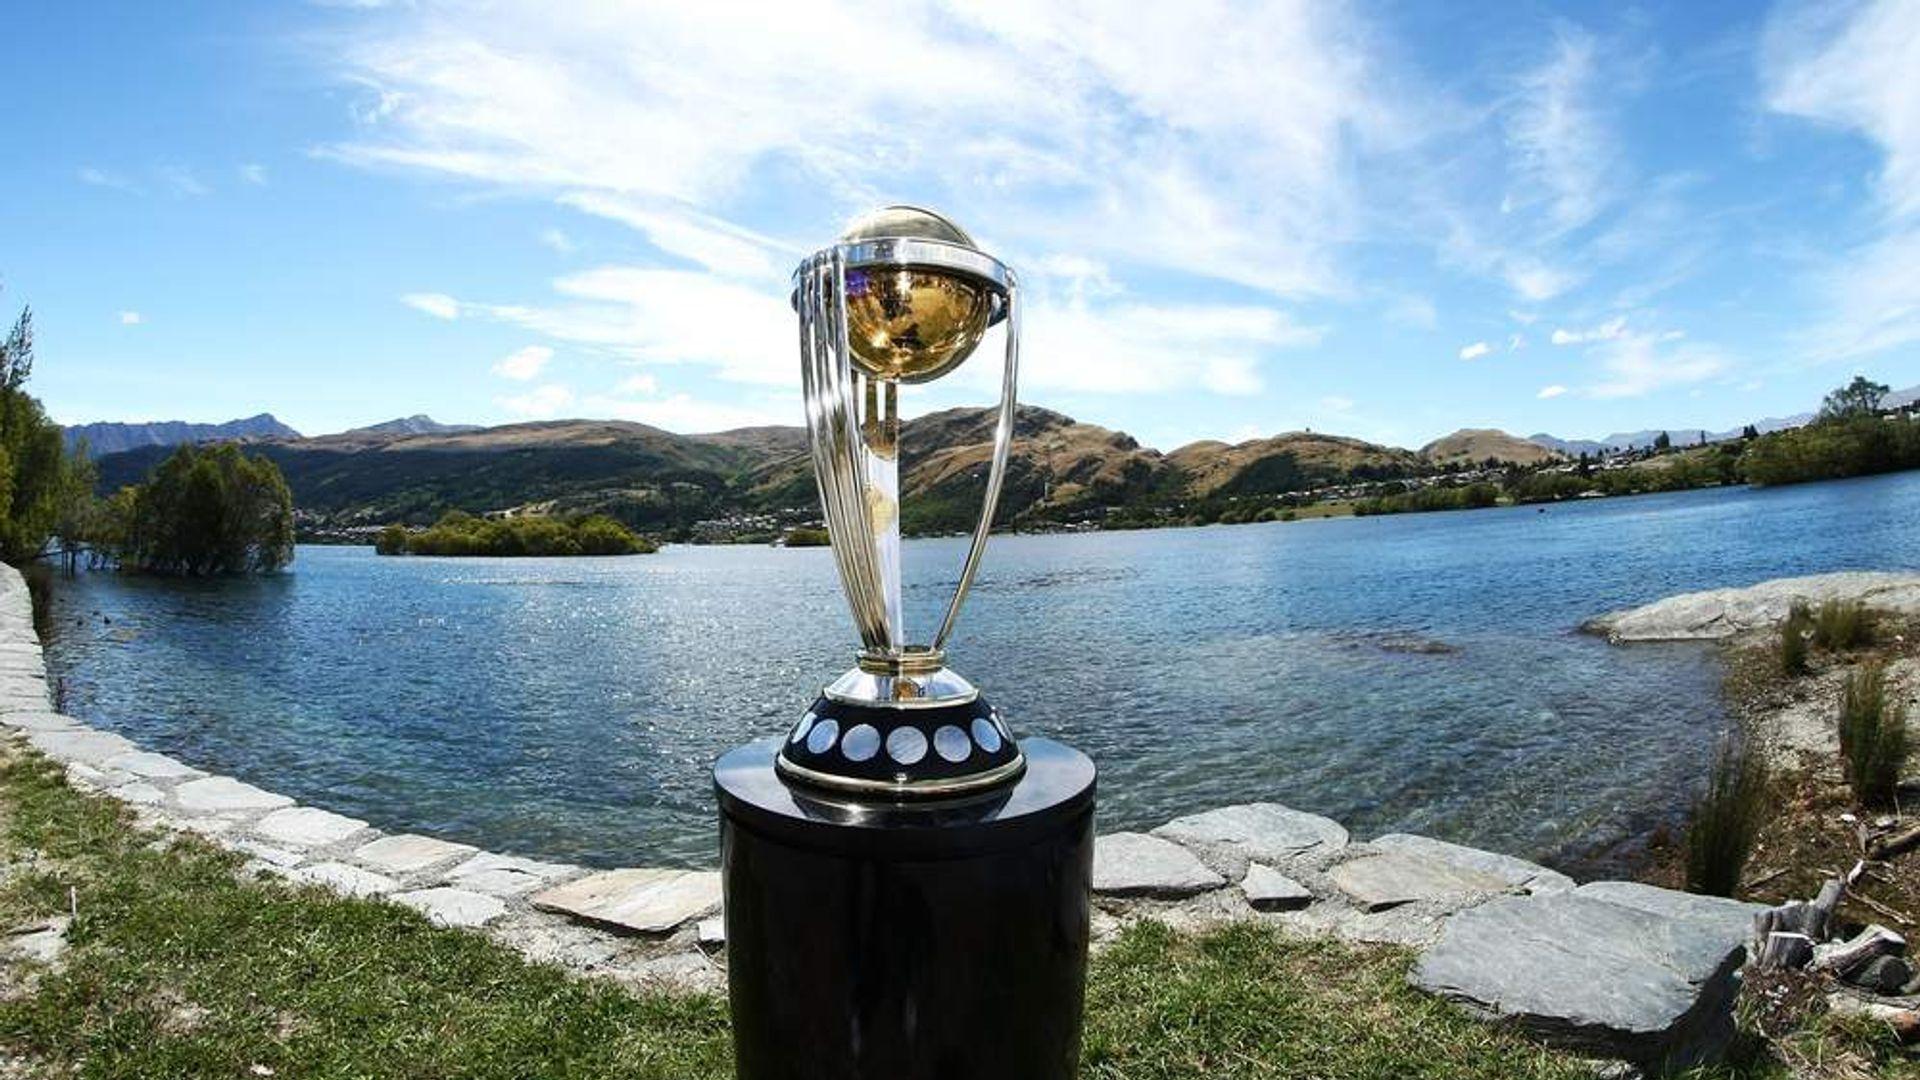 Photos: india bids adieu to master blaster, god of cricket sachin tendulkar